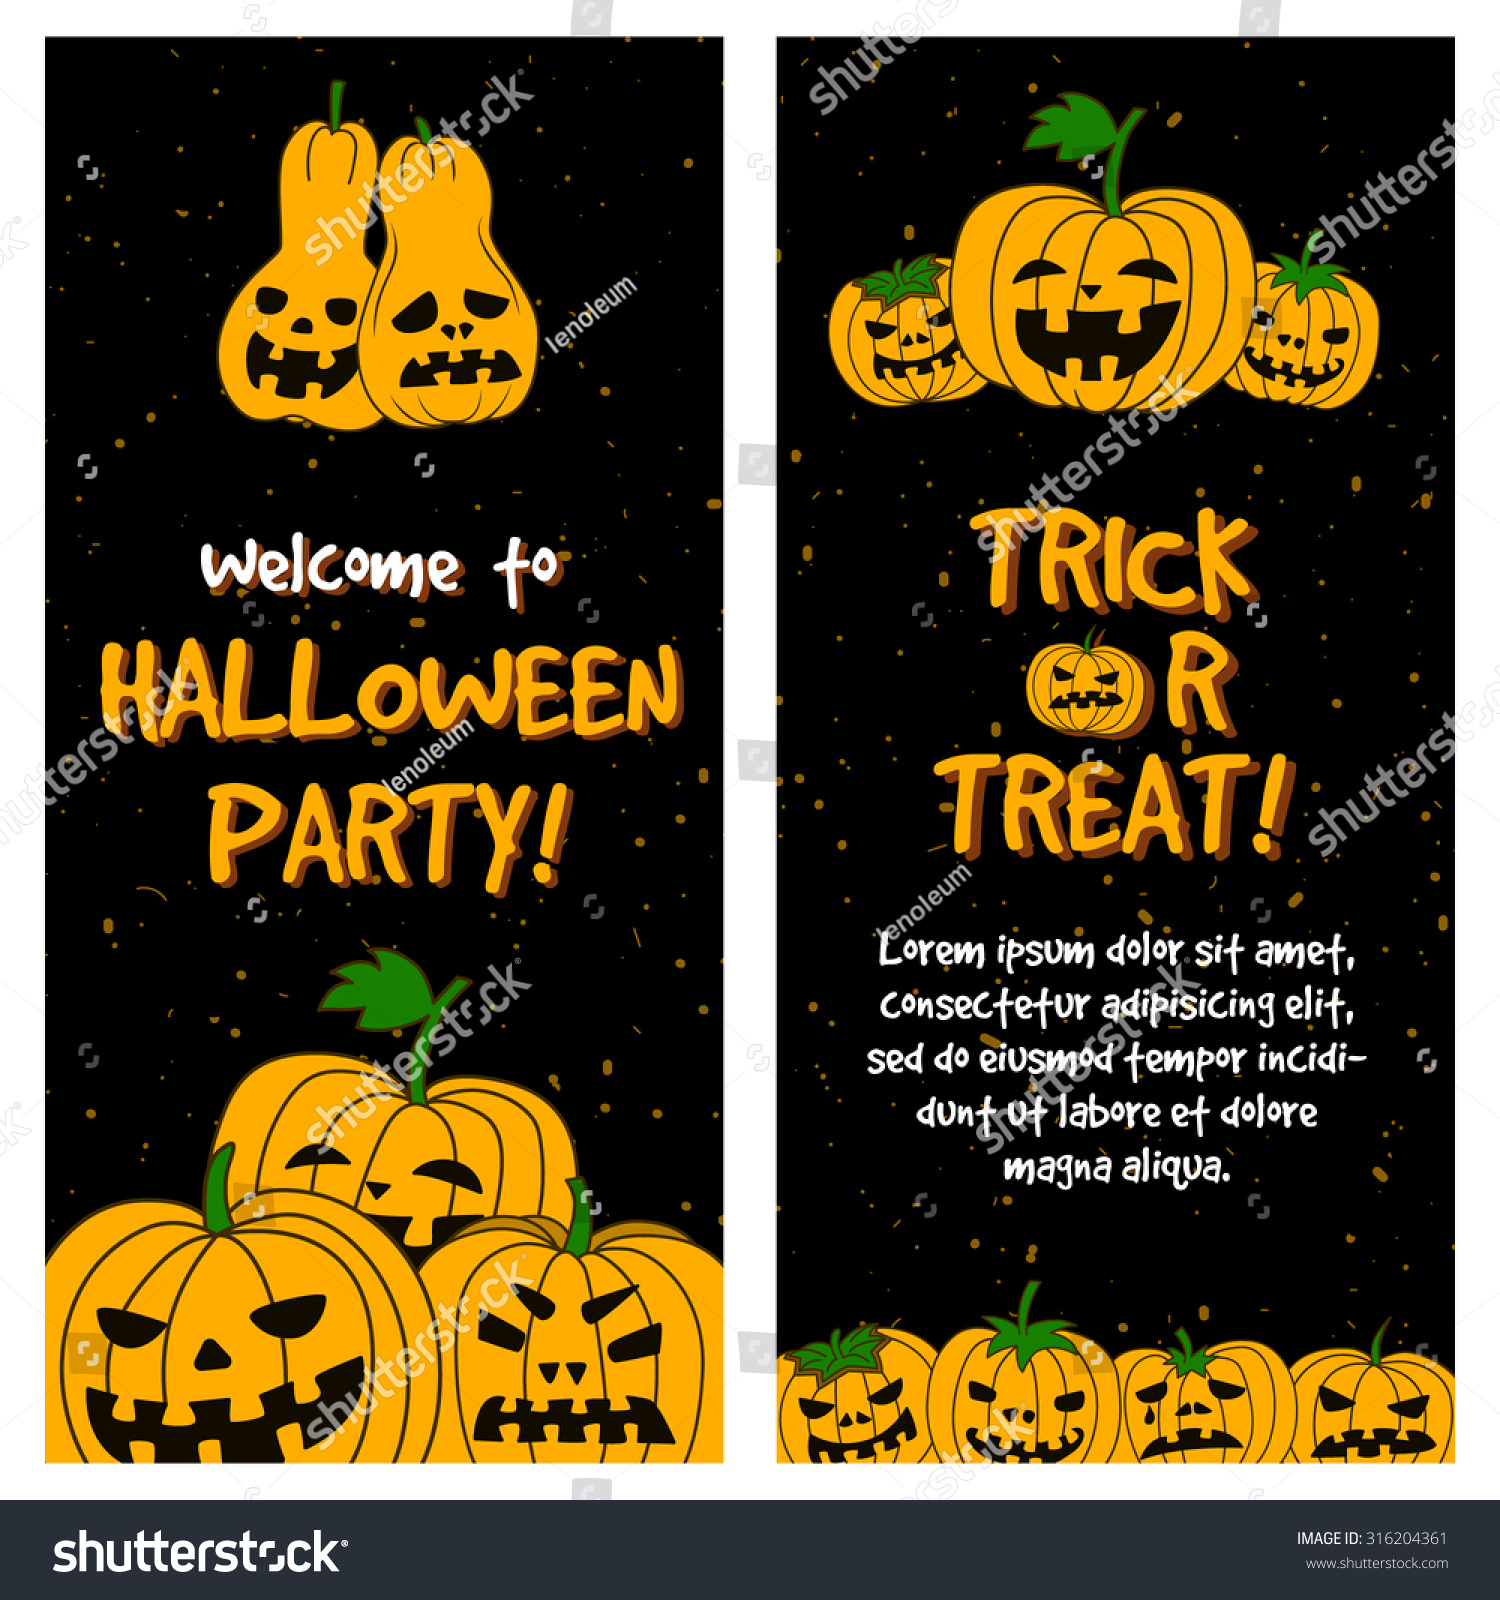 Images of Michael Davoodifar Halloween Party - Halloween Ideas